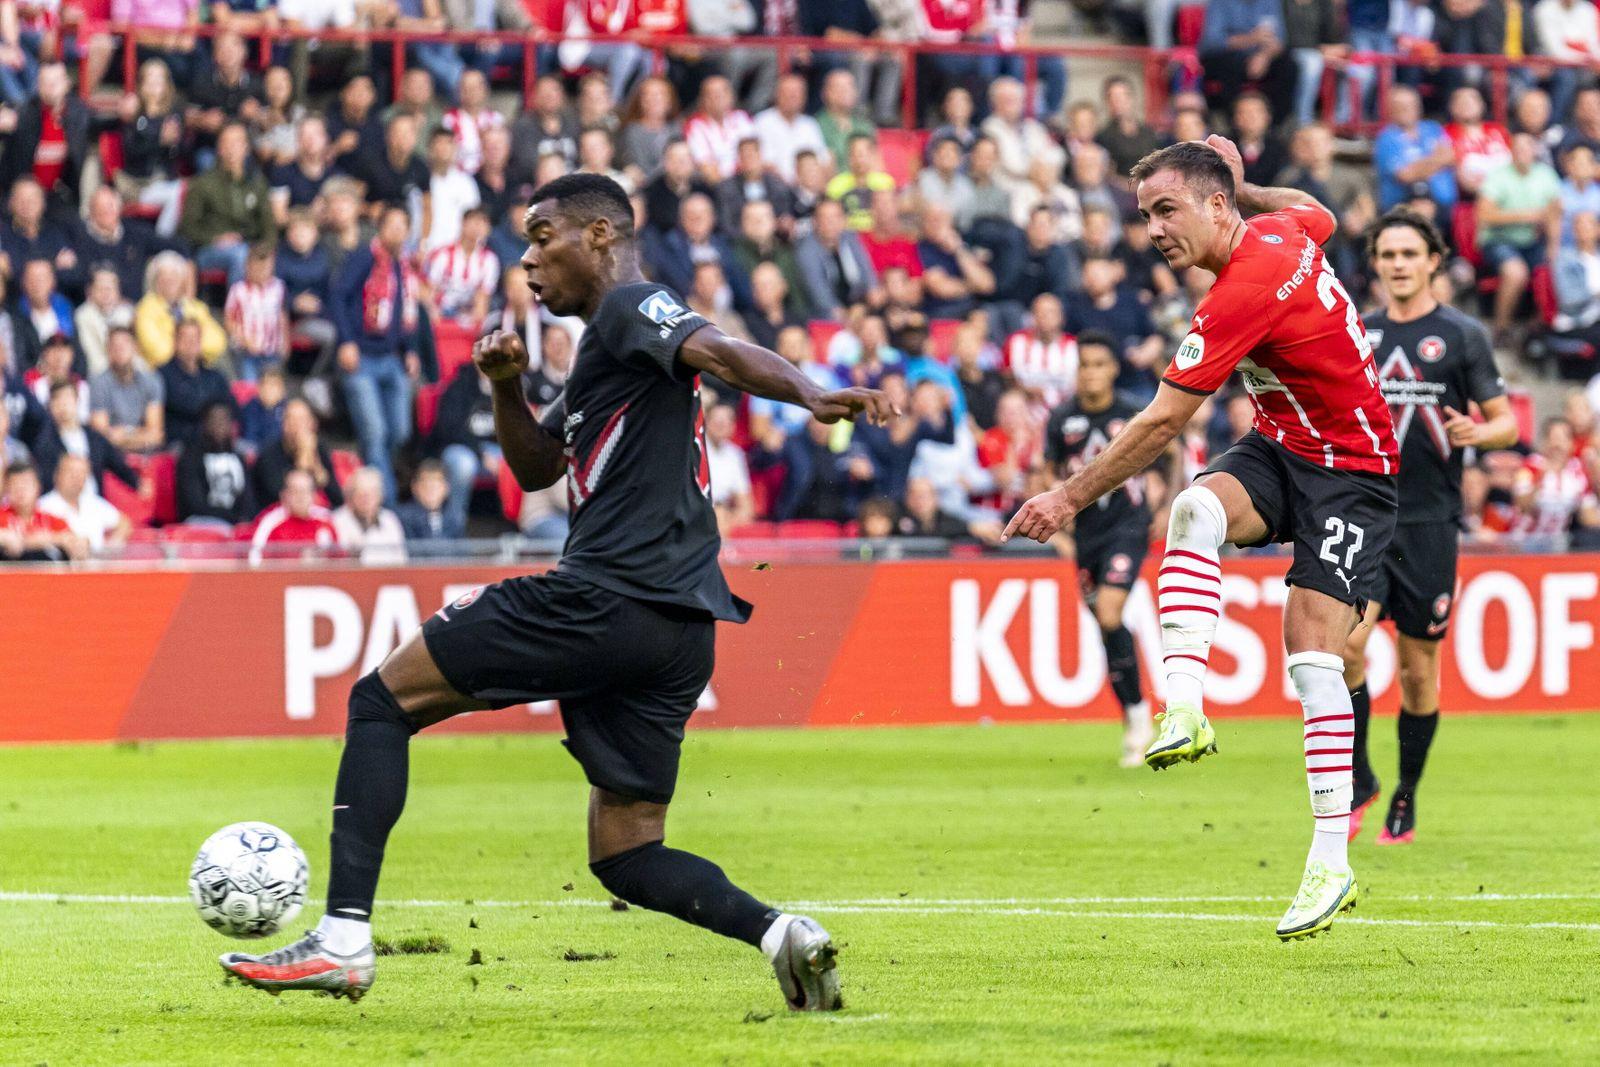 EINDHOVEN, Netherlands, 03-08-2021, football, Philips stadium, third qualification round Champions League, season 2021